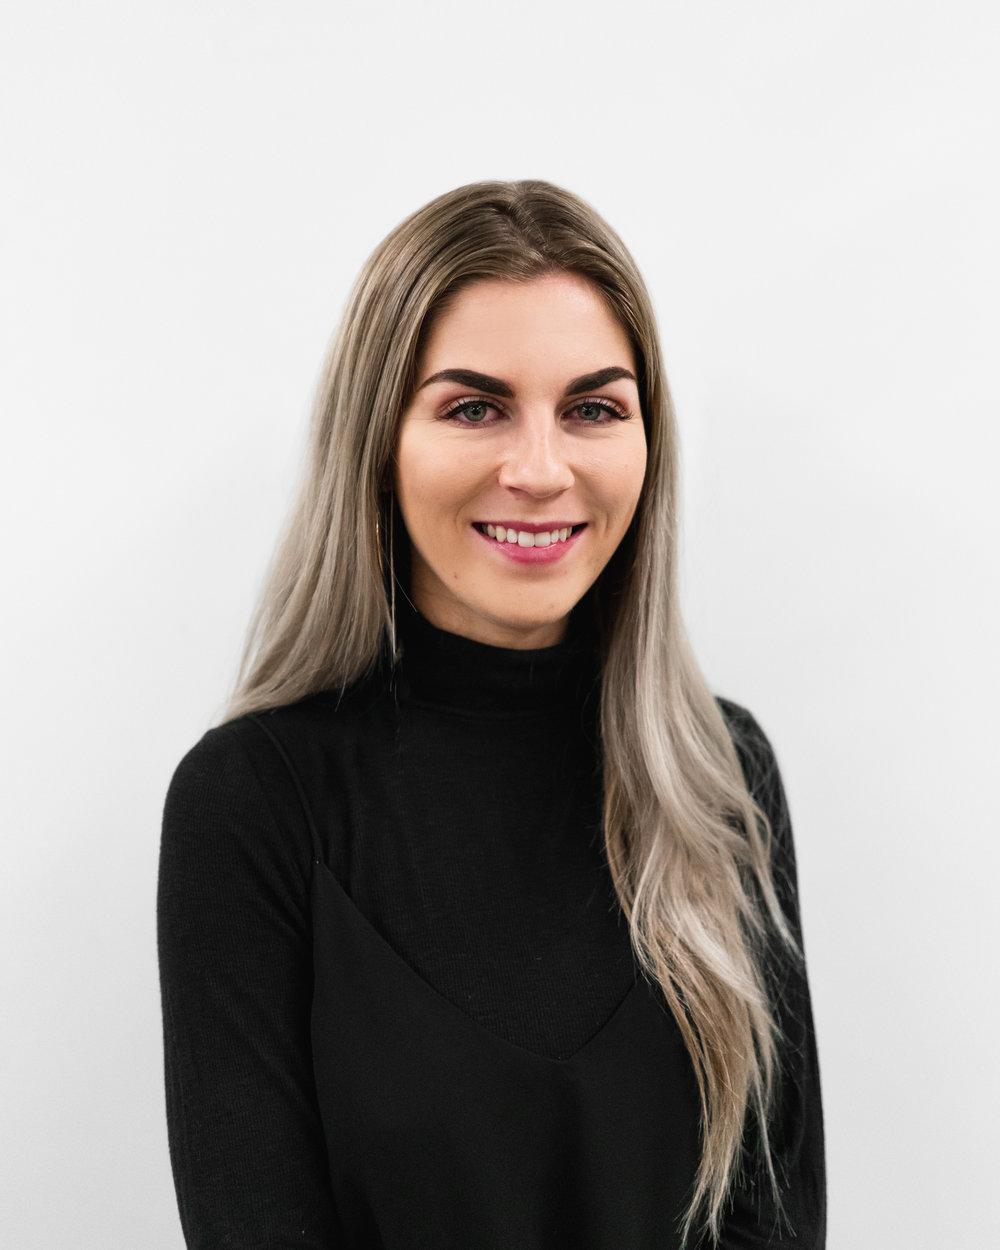 STEPHANIE SWANN - Co Secretary/Treasurer